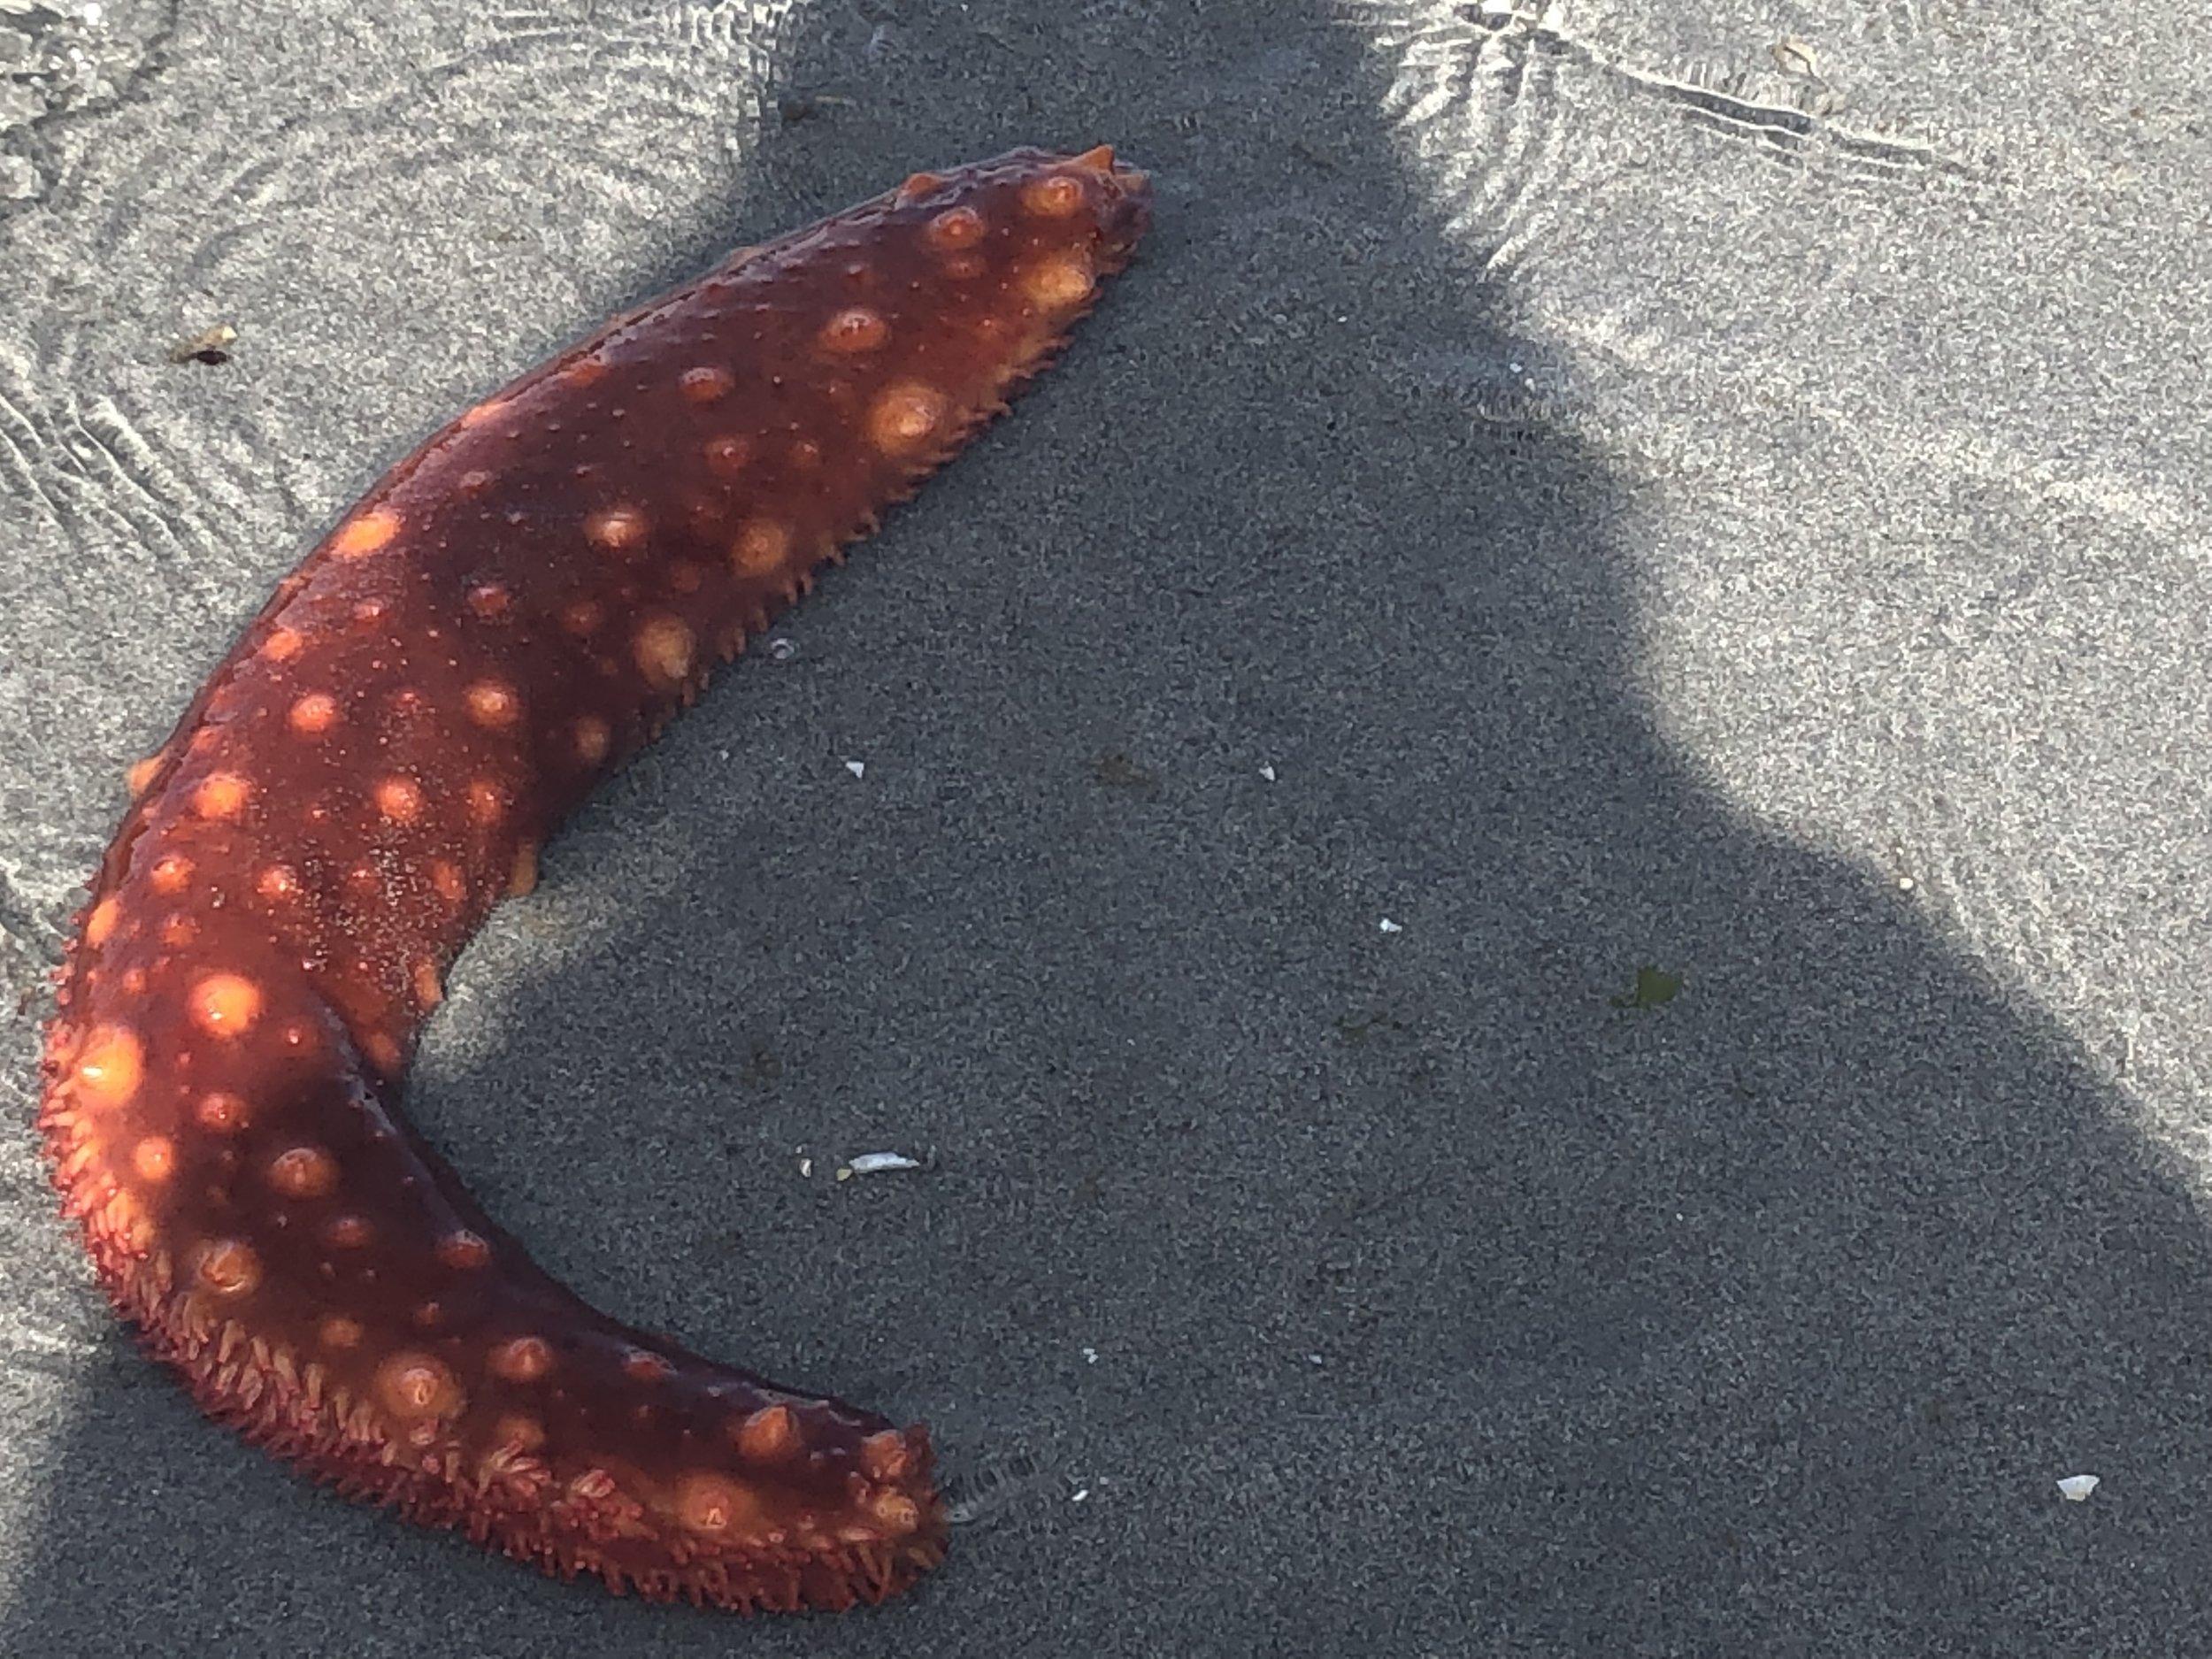 Sea Cucumber at Low Tide